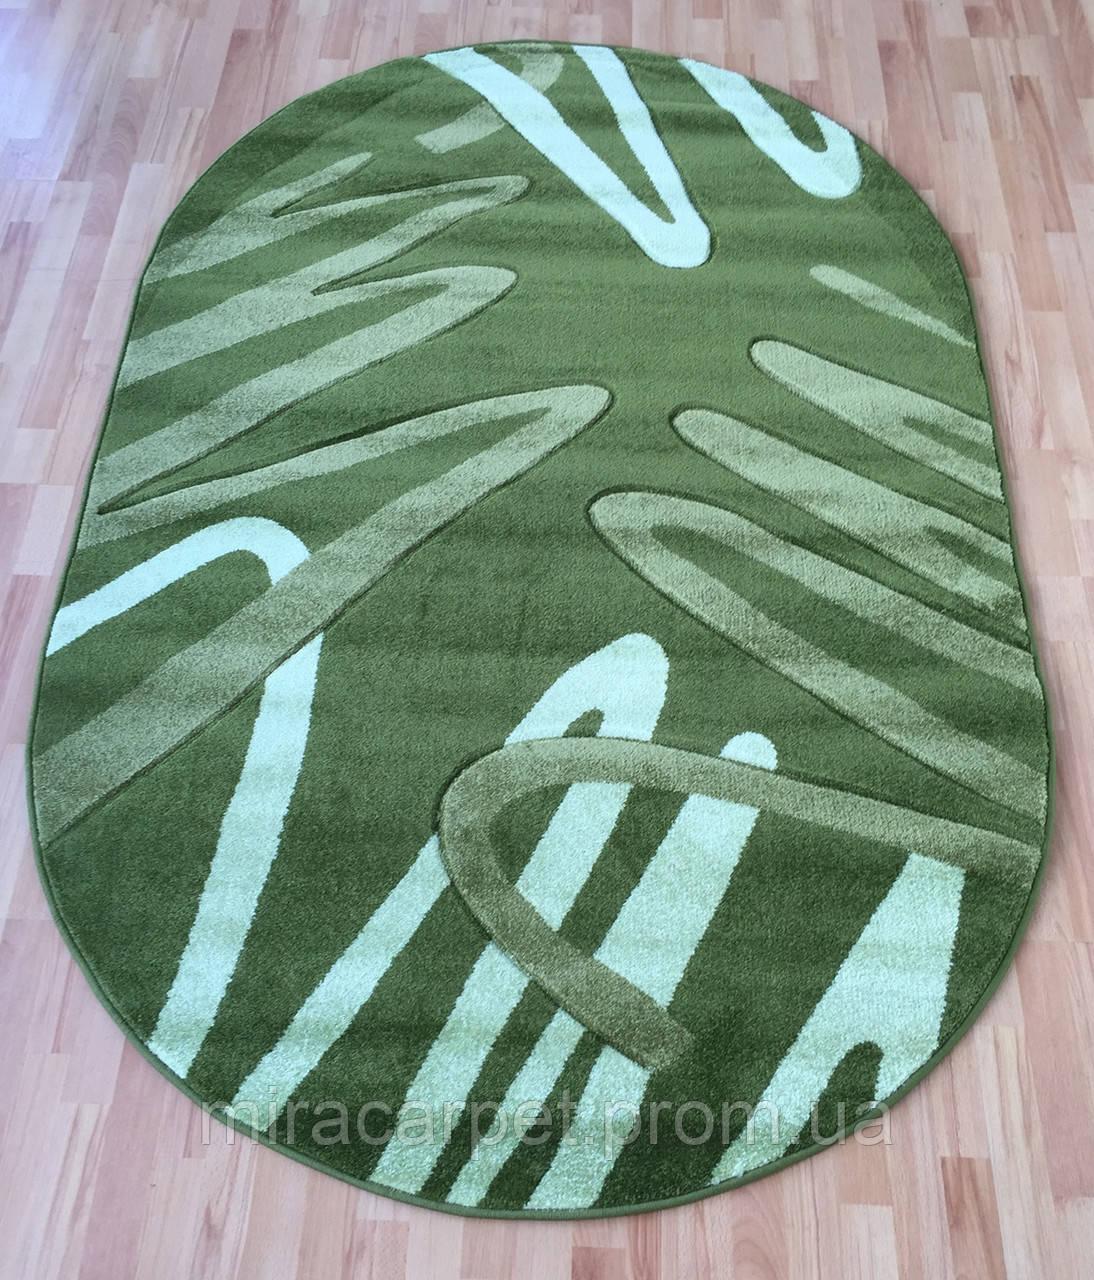 Зеленый турецкий ковер Fruze